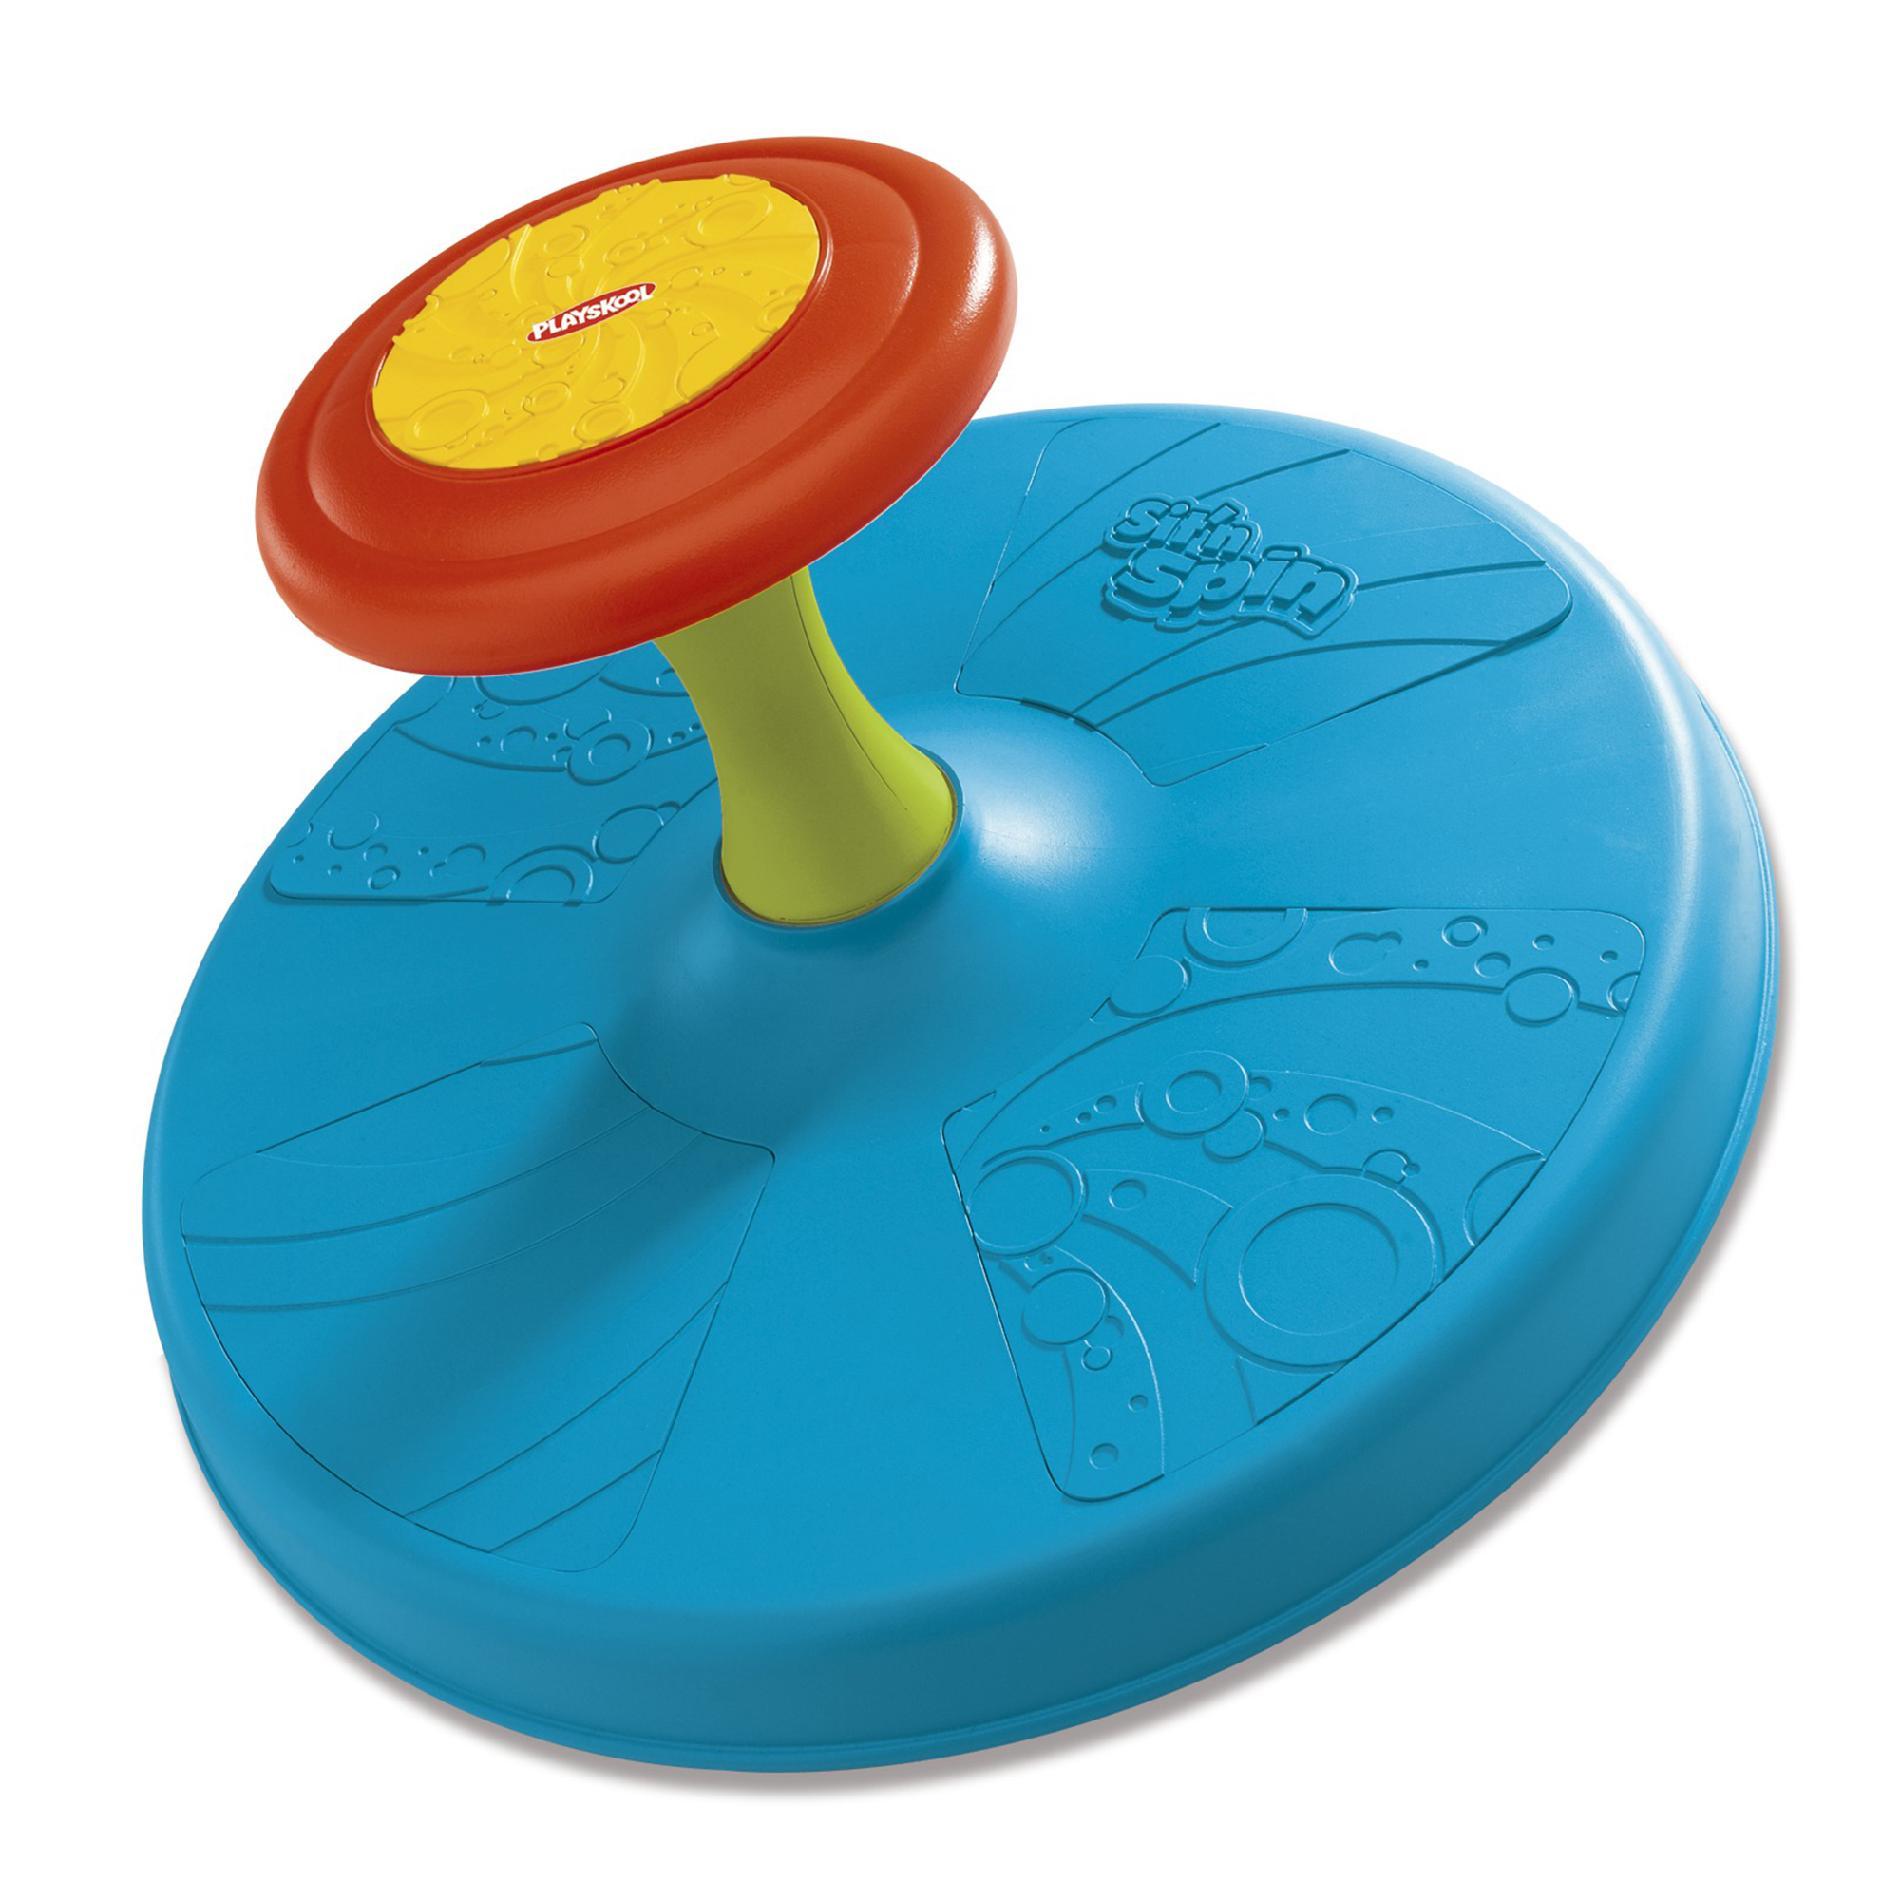 Playskool Play Favorites Classic Sit N Spin Toy